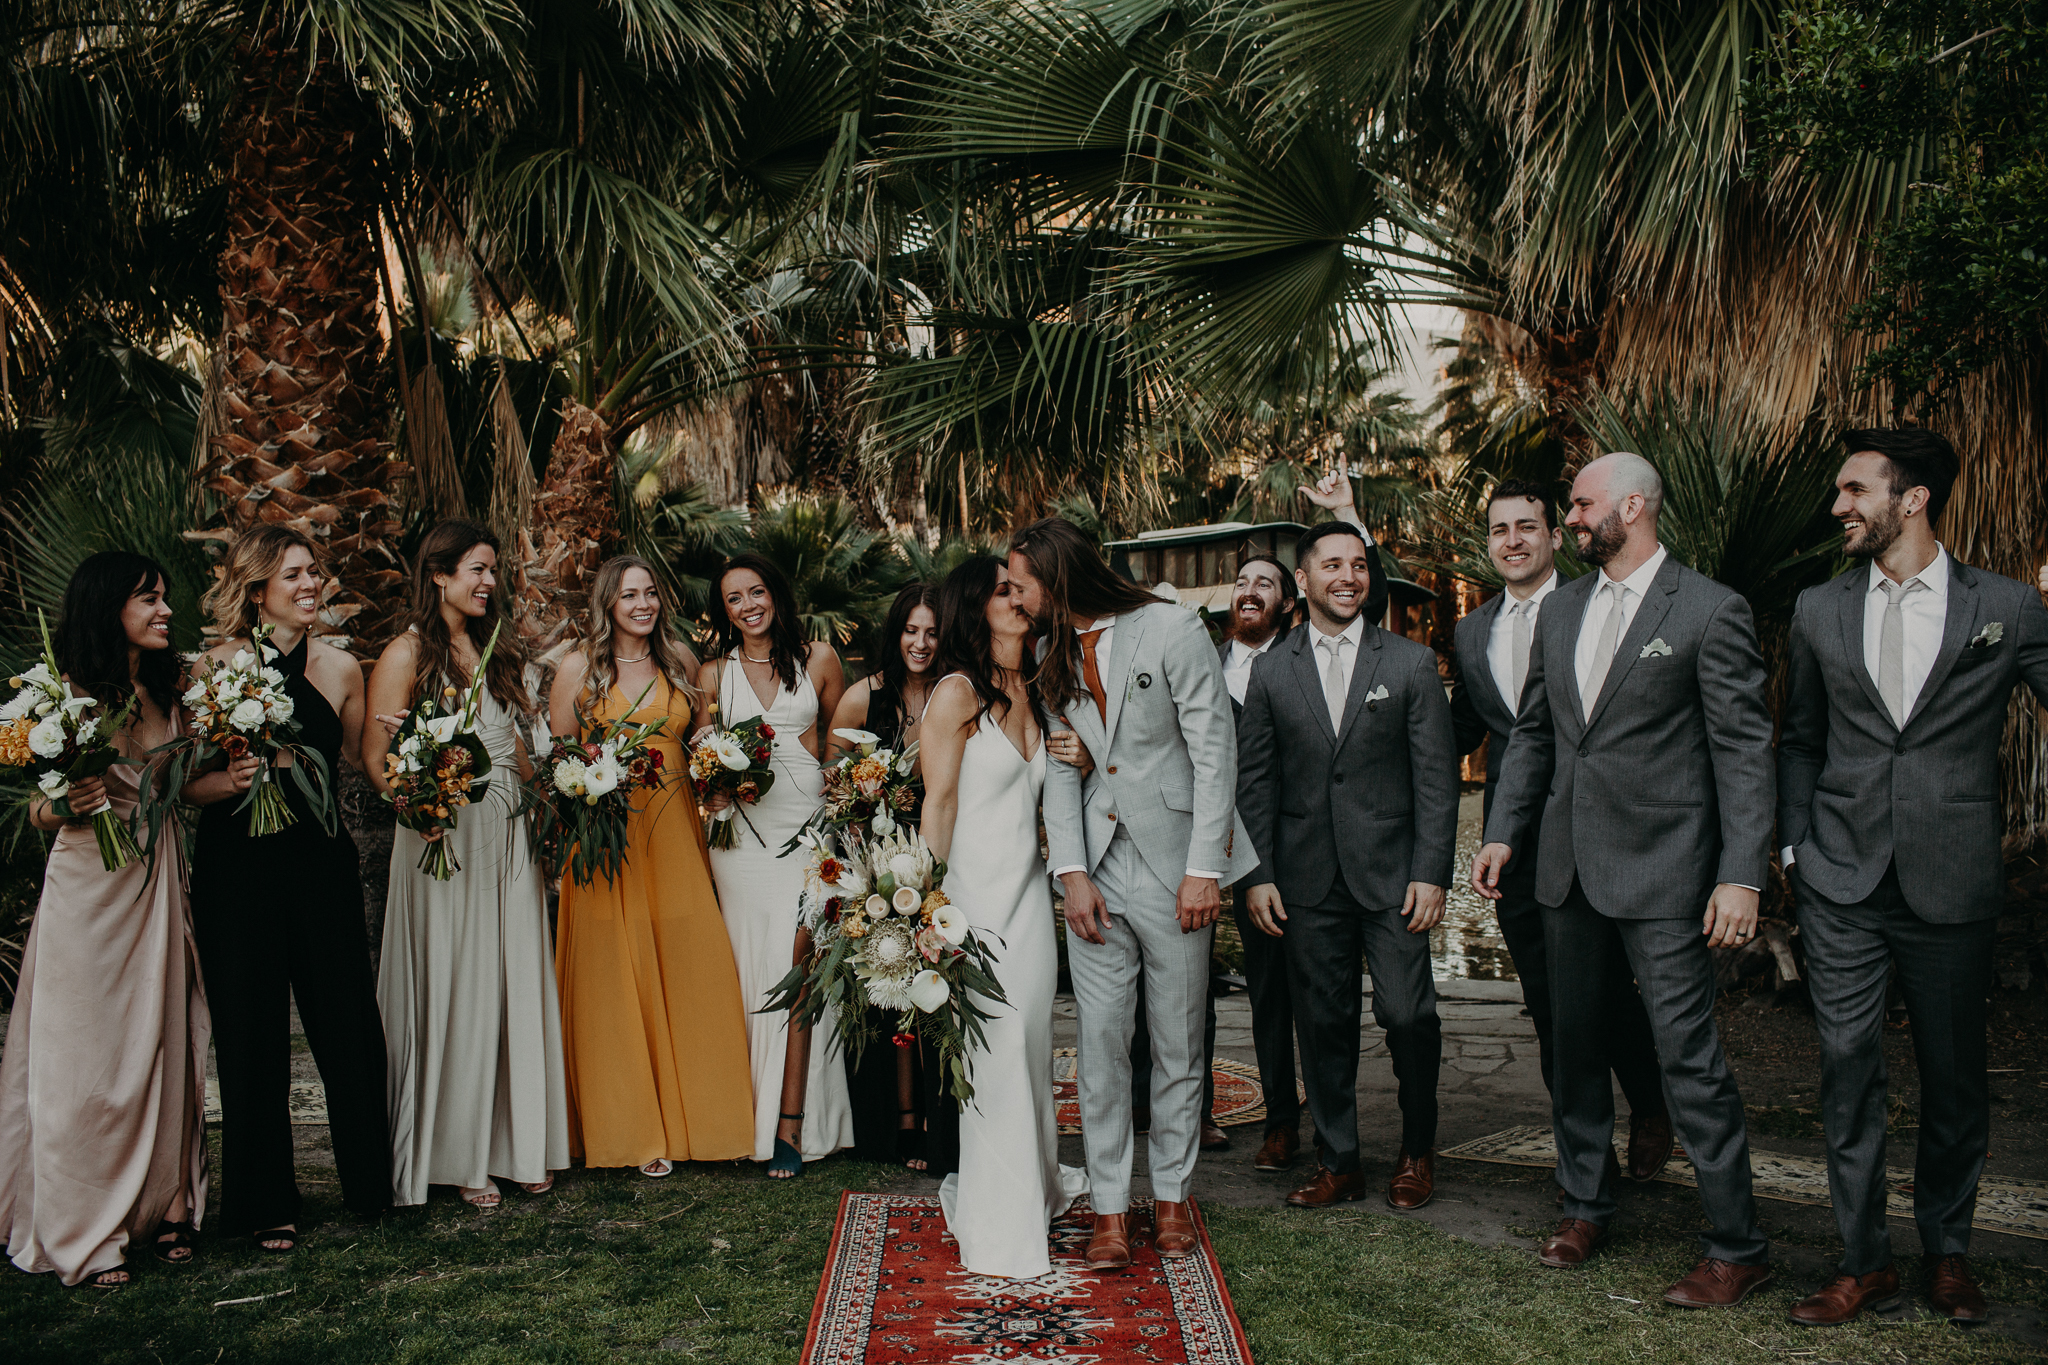 Twentynine-Palms-Inn-Wedding.jpg